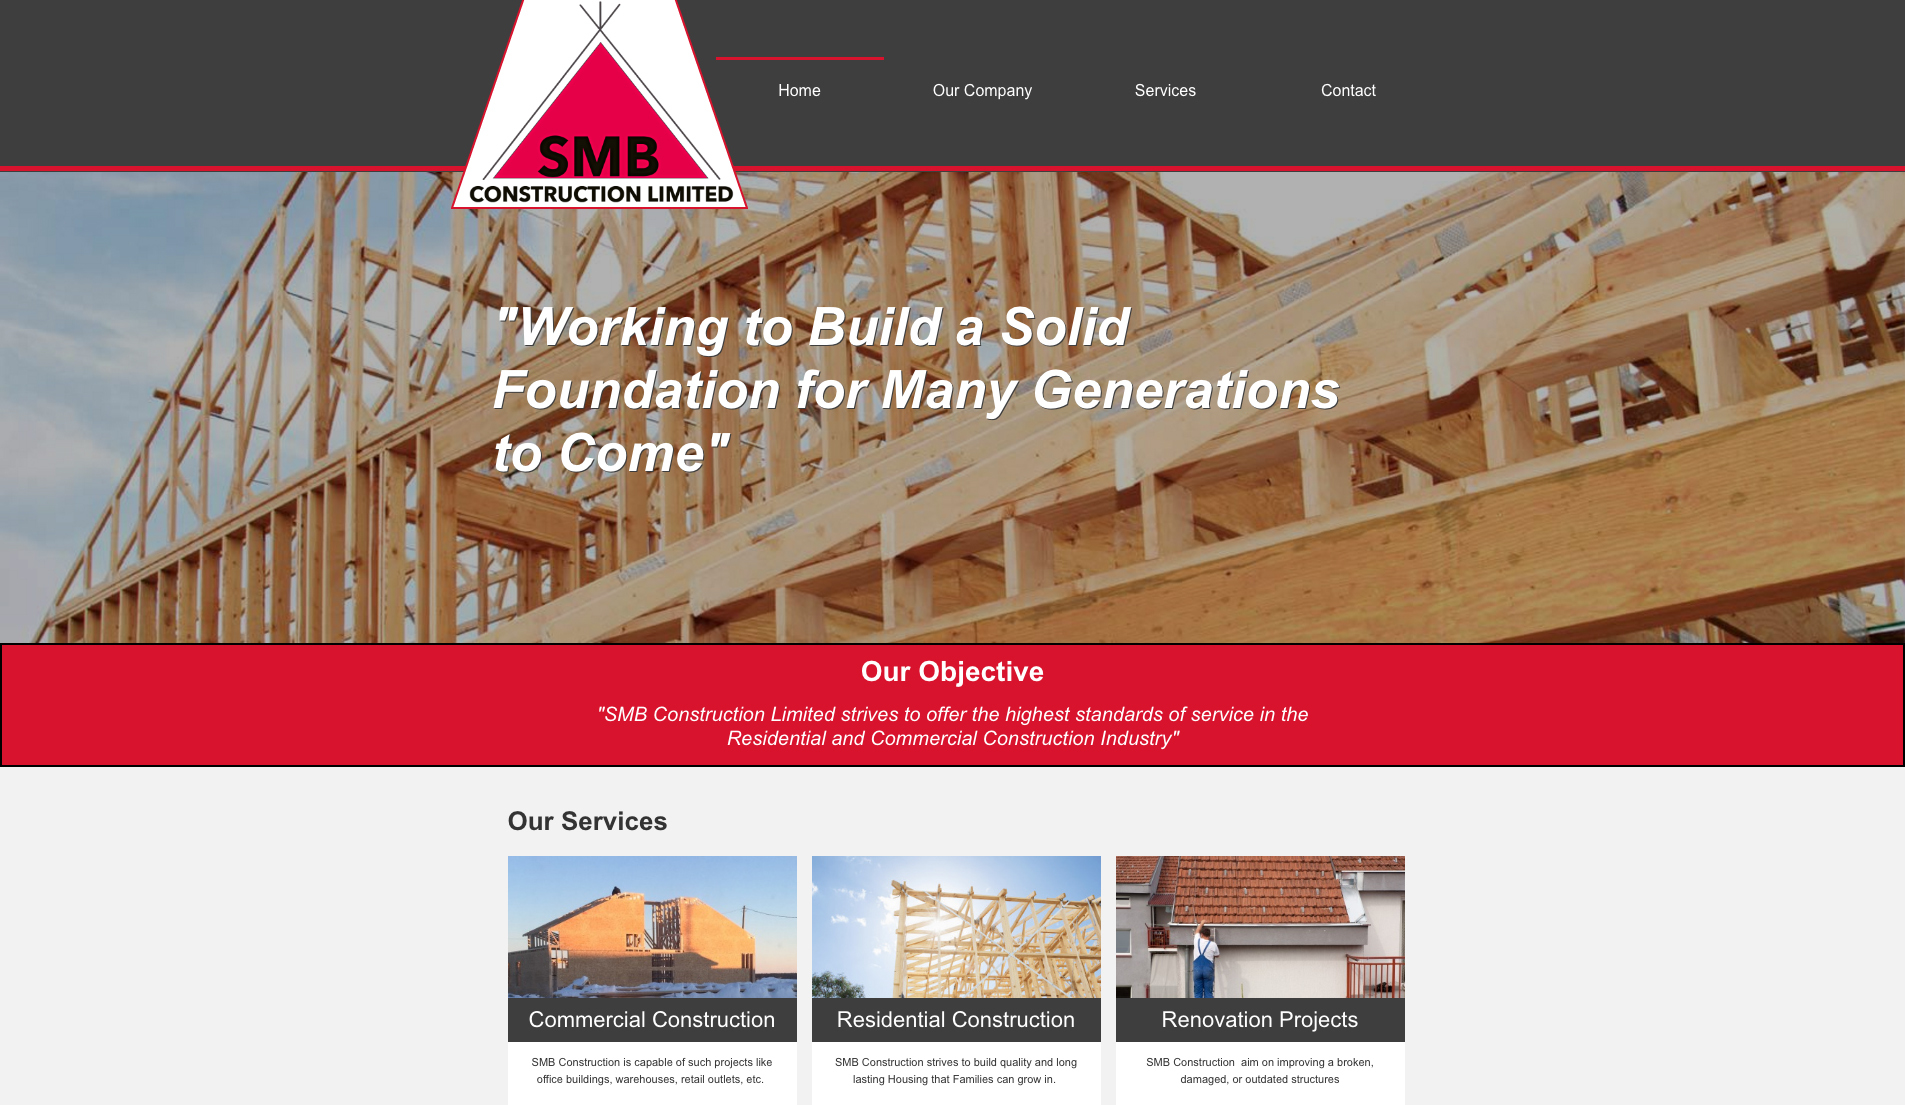 SMB Construction Limited - Set Up & Go Plan